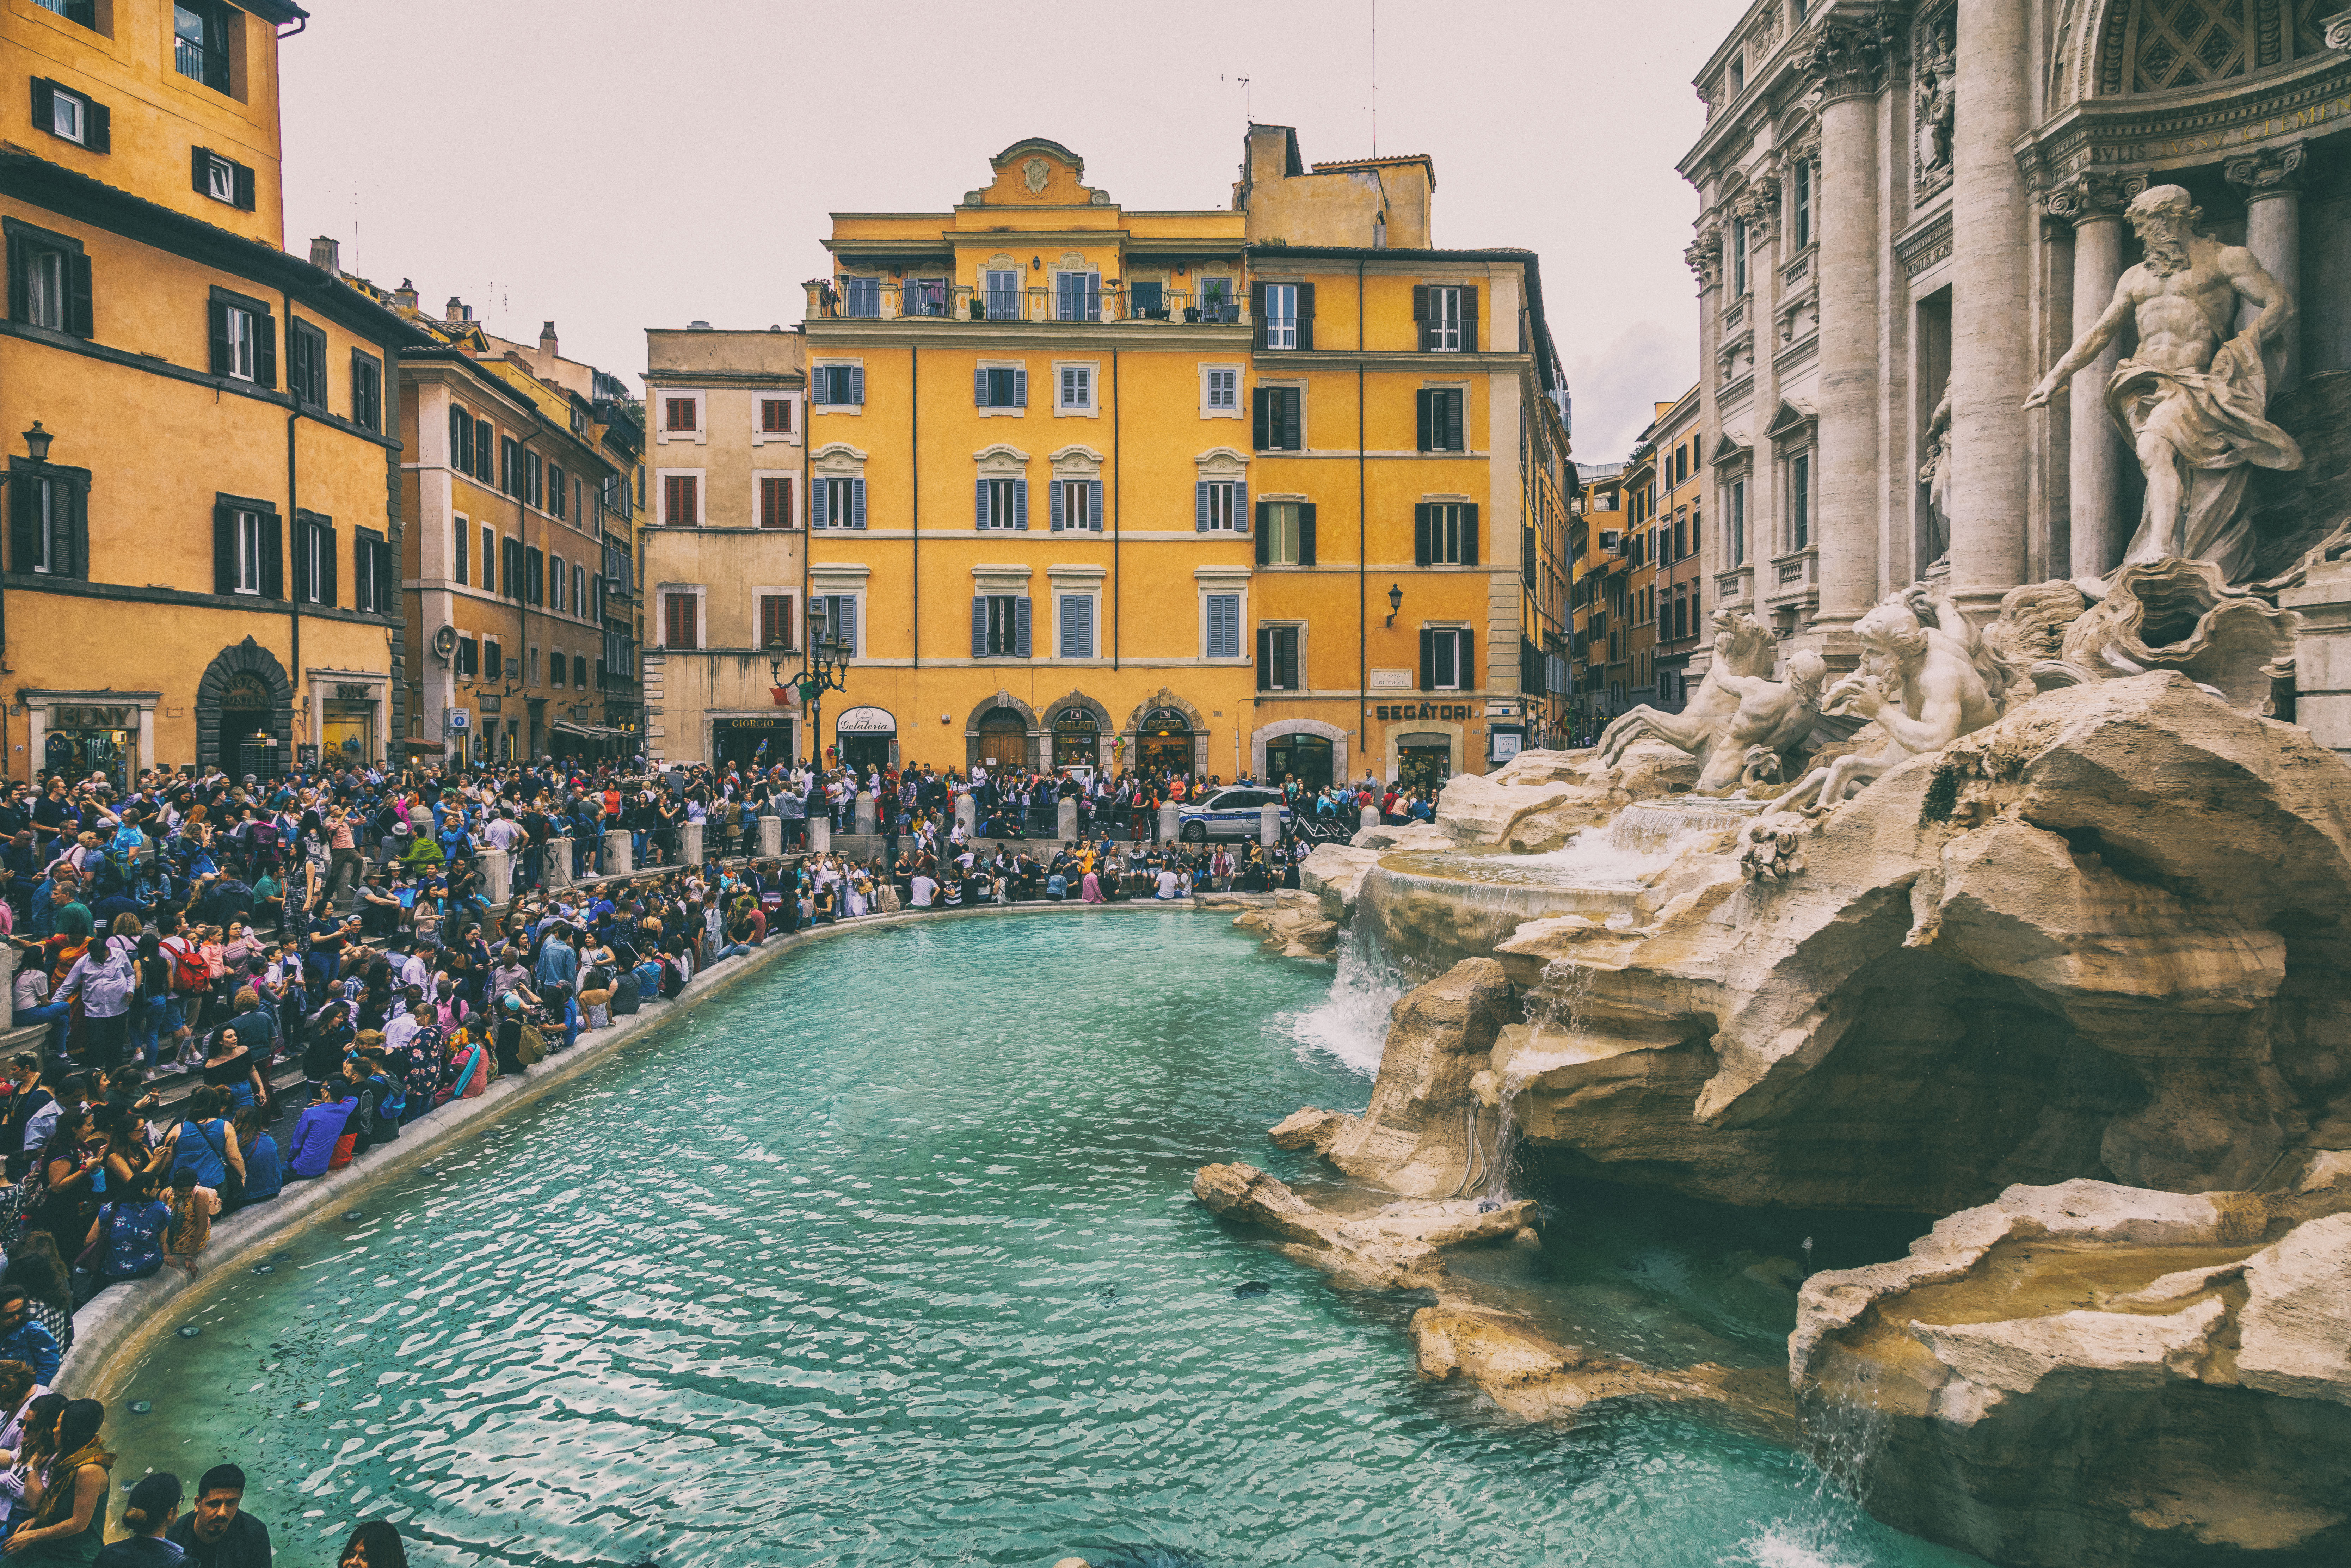 Fontana di Trevi A